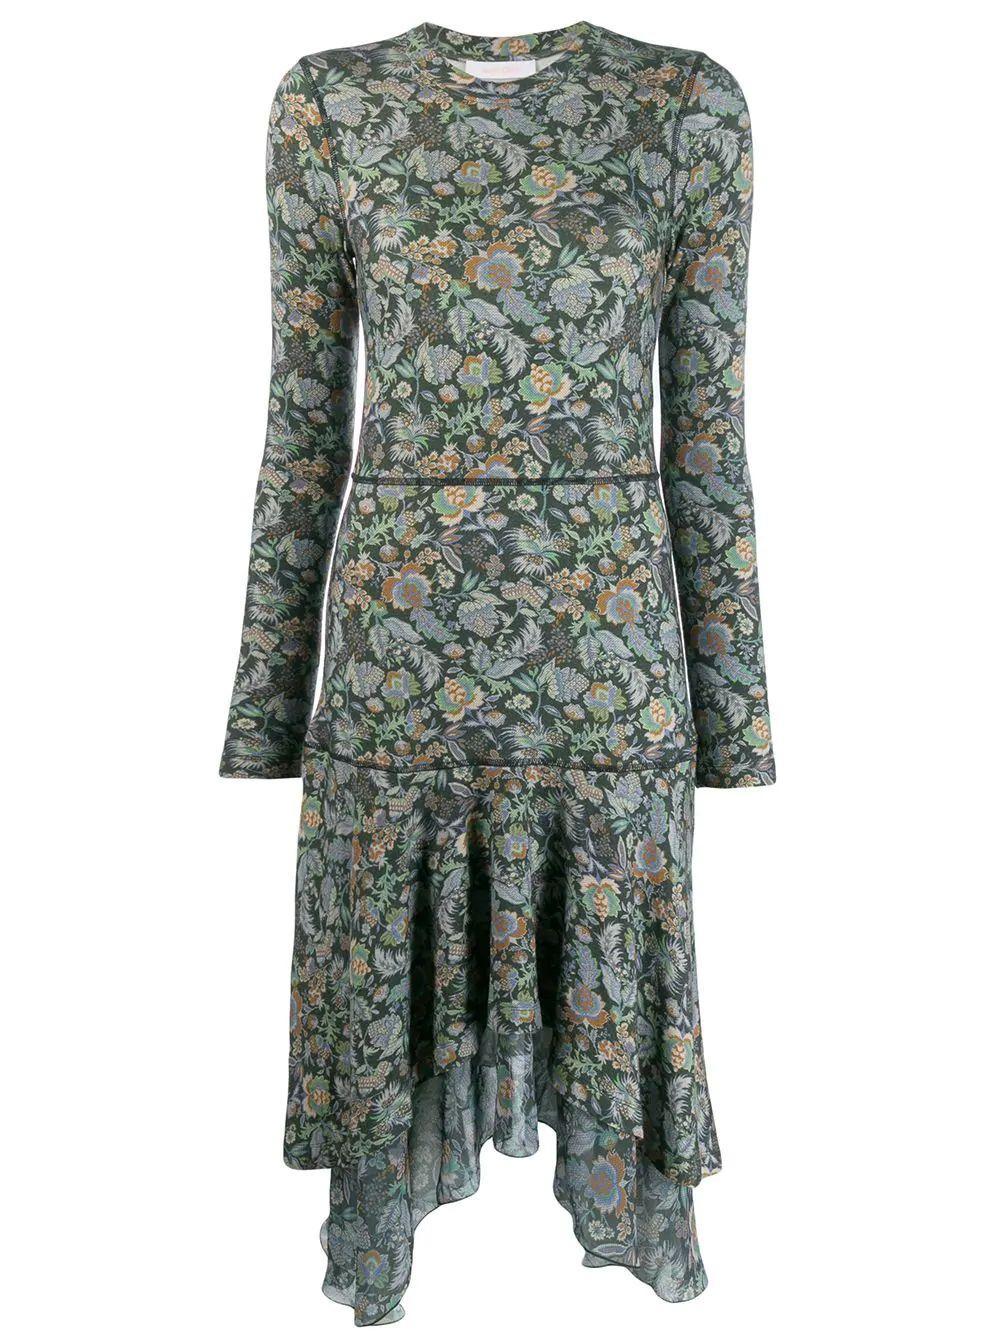 Long Sleeve Floral Print Dress With Asymm Skirt